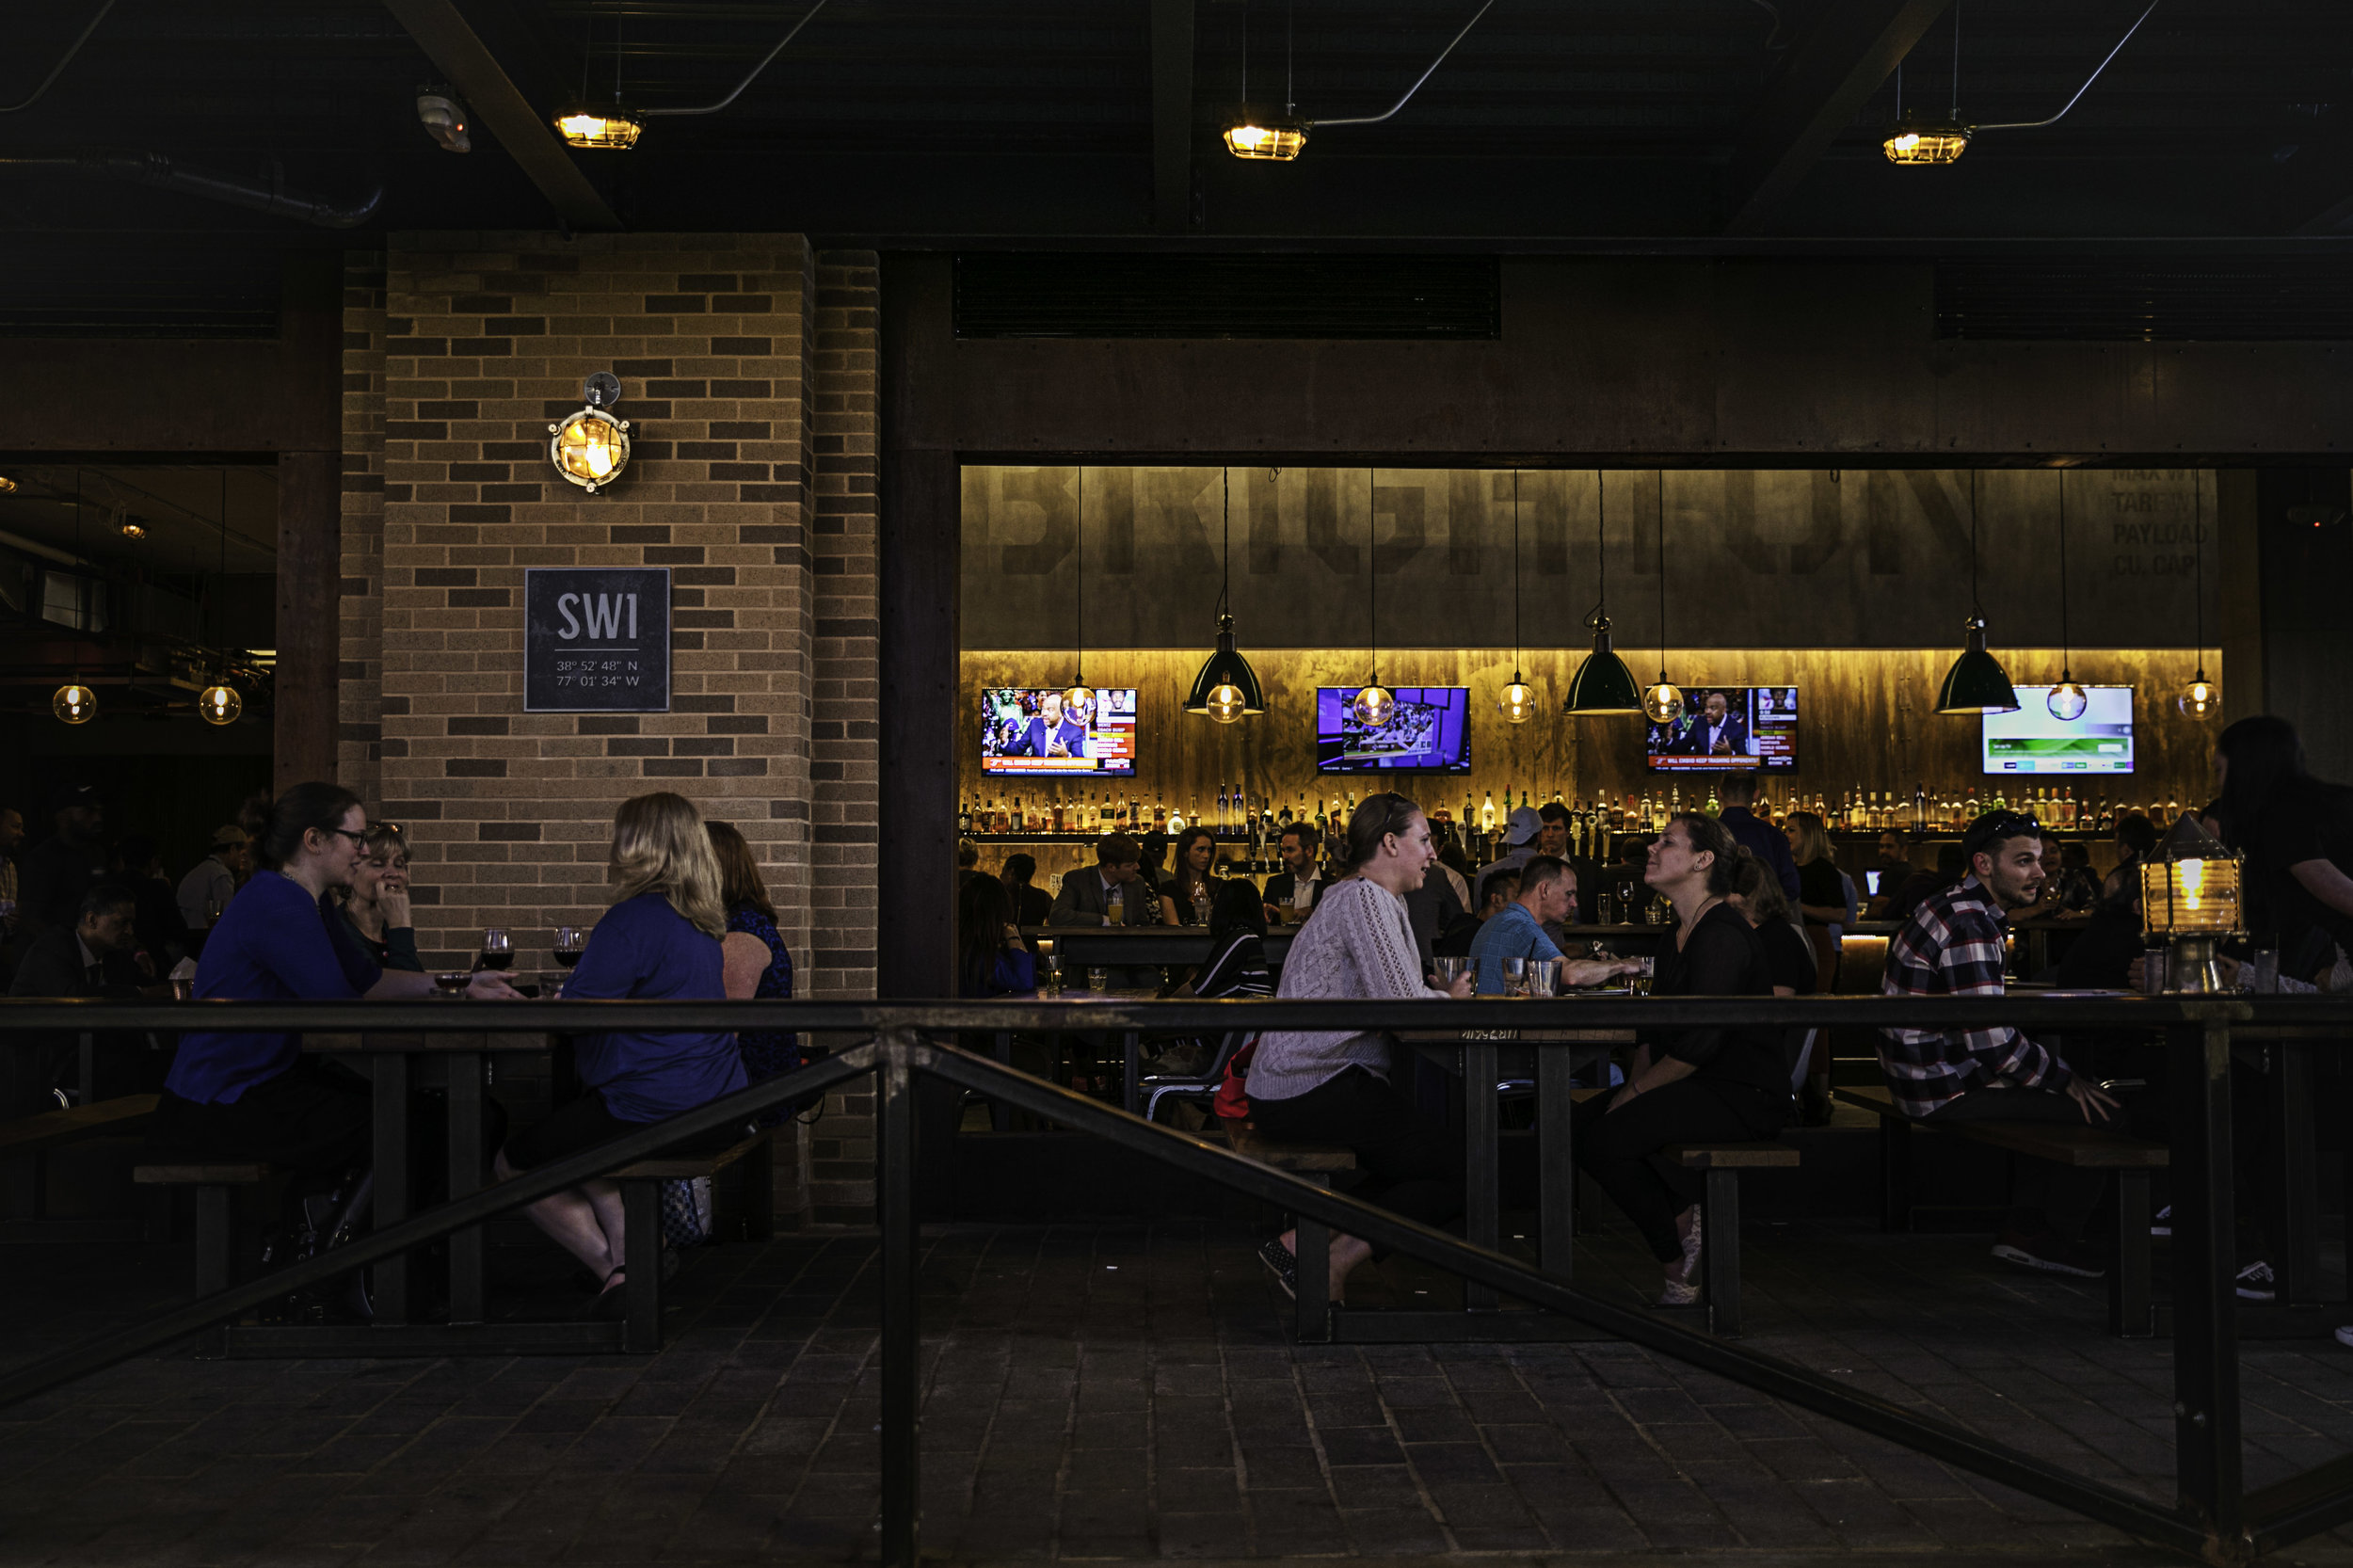 studio-saint-bars-and-restaurants-the-brighton-washington-dc-8